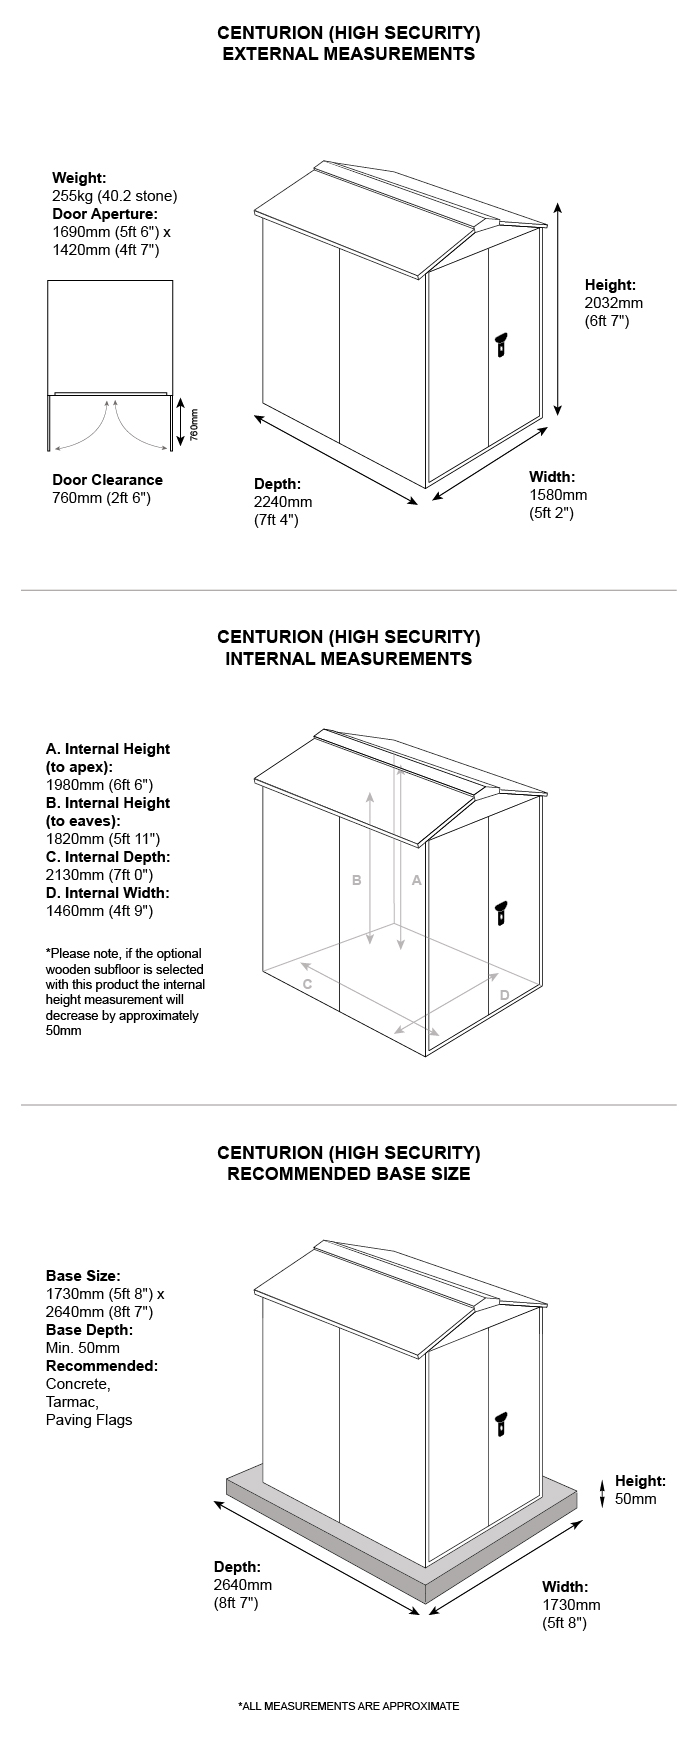 Centurion Shed - Dimensions sheet